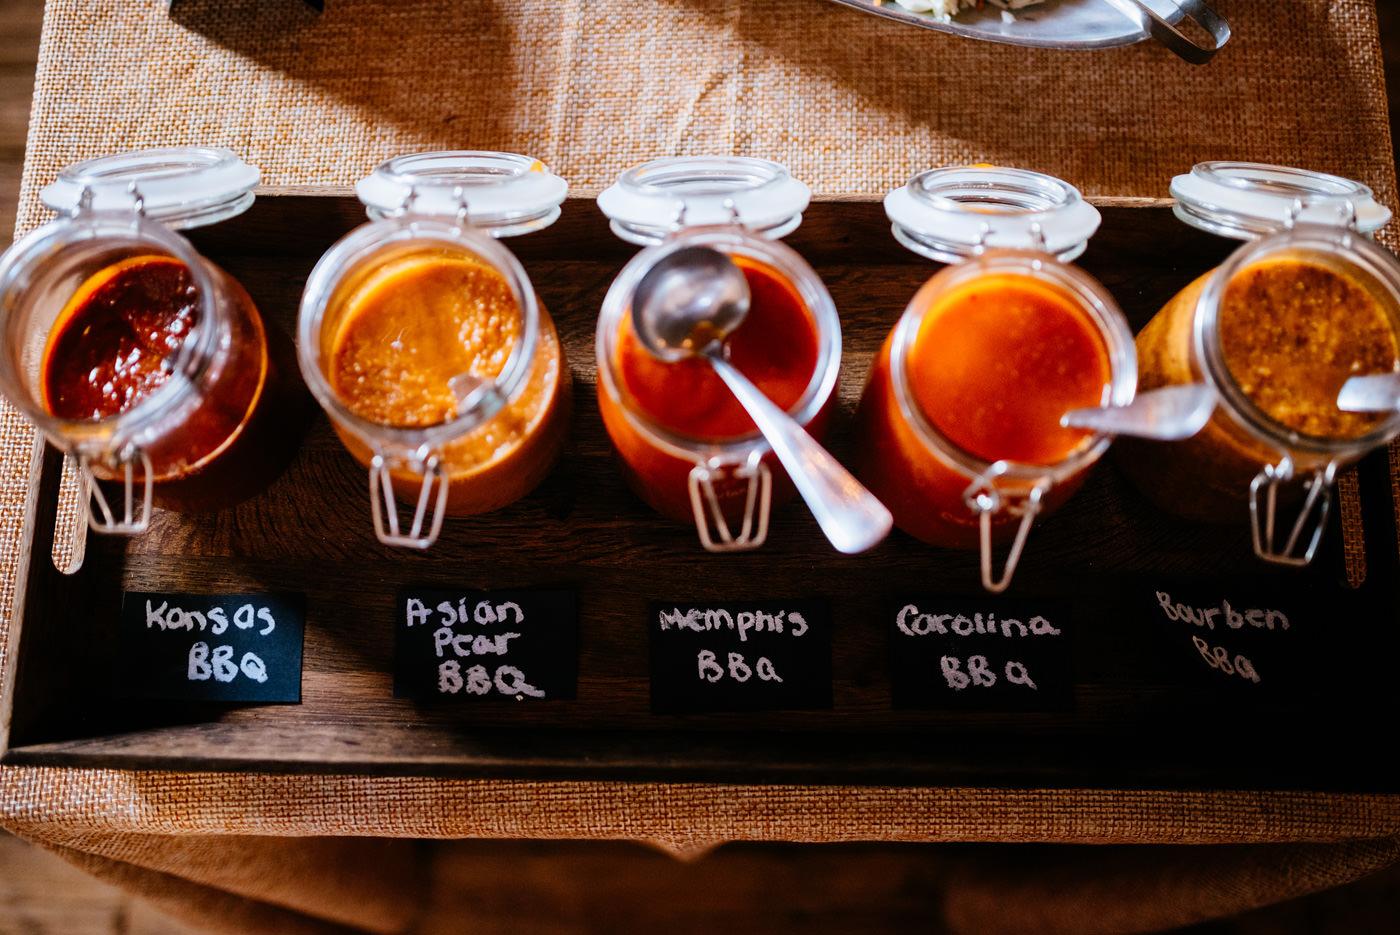 bbq sauce options at wv wedding reception